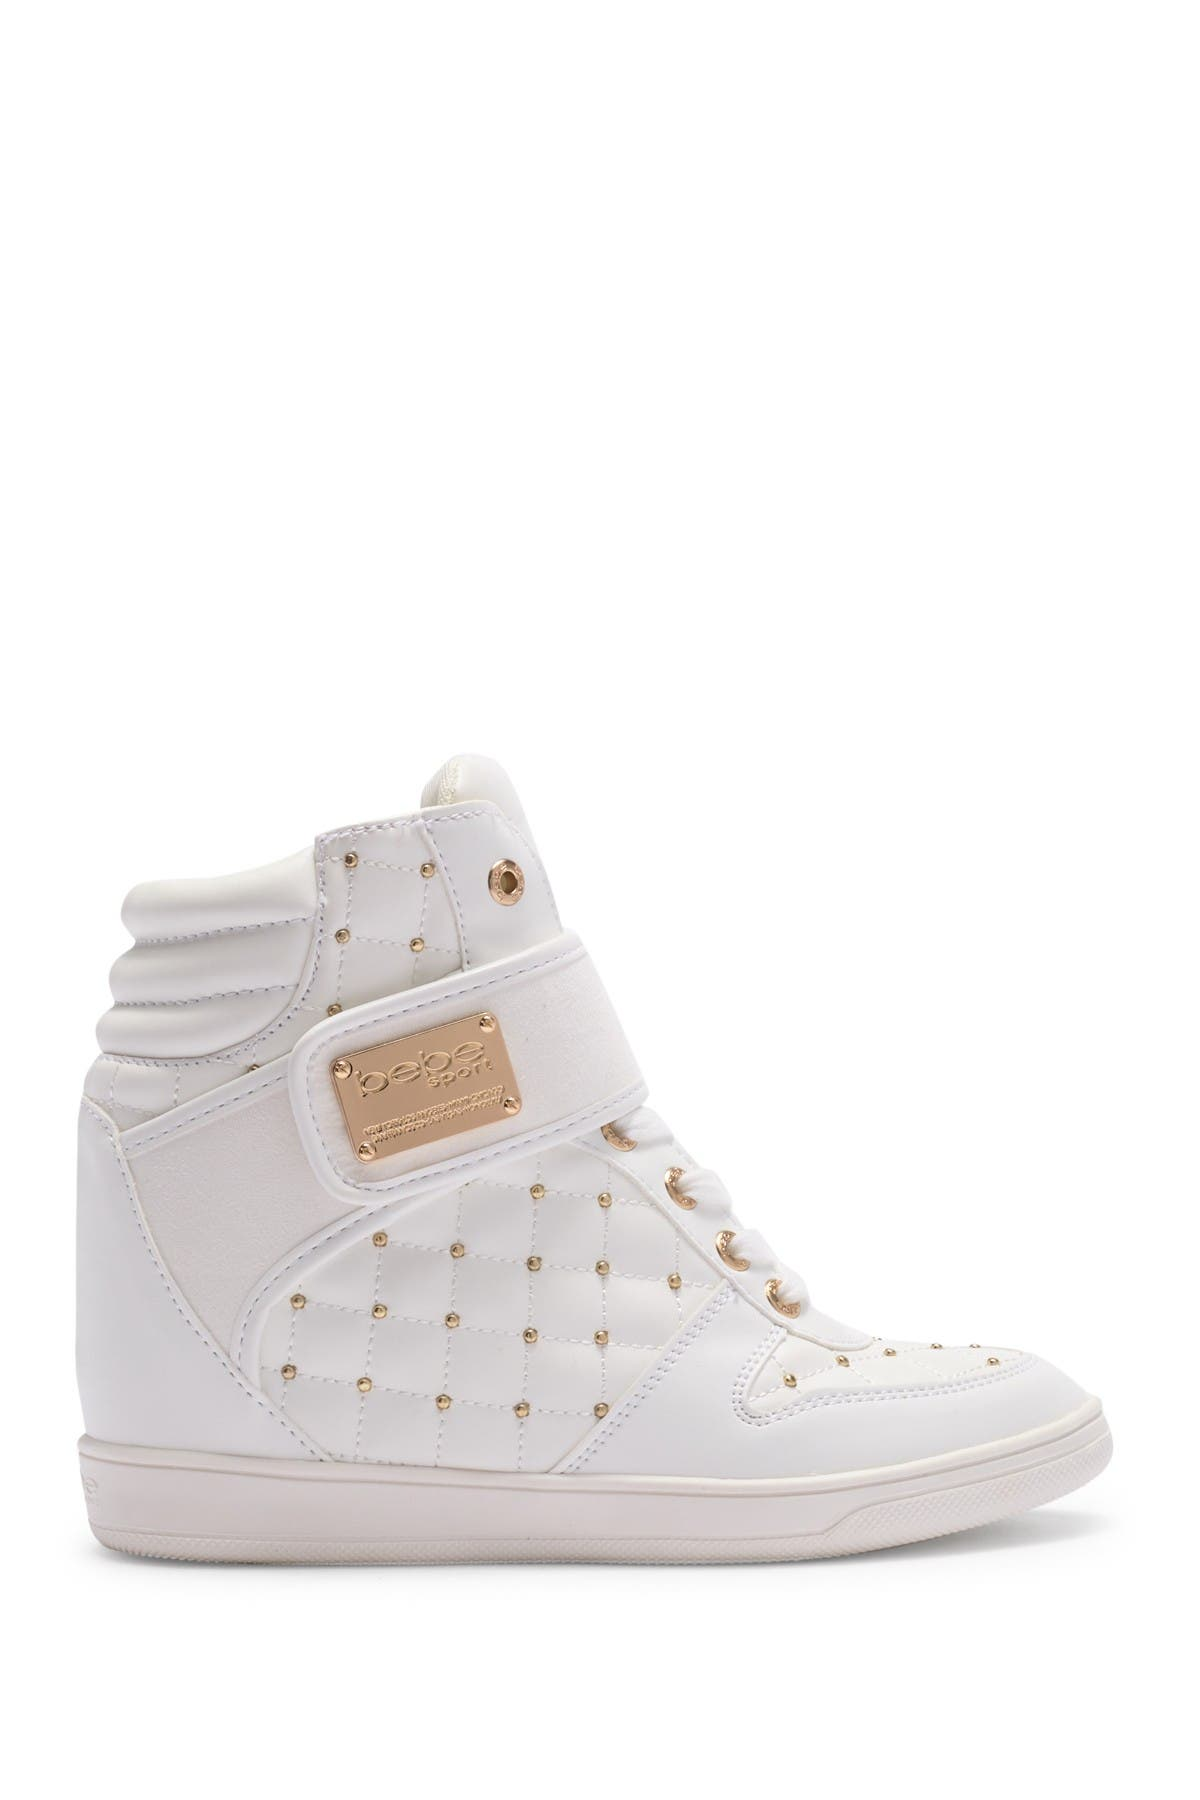 bebe | Studded High Top Wedge Sneaker